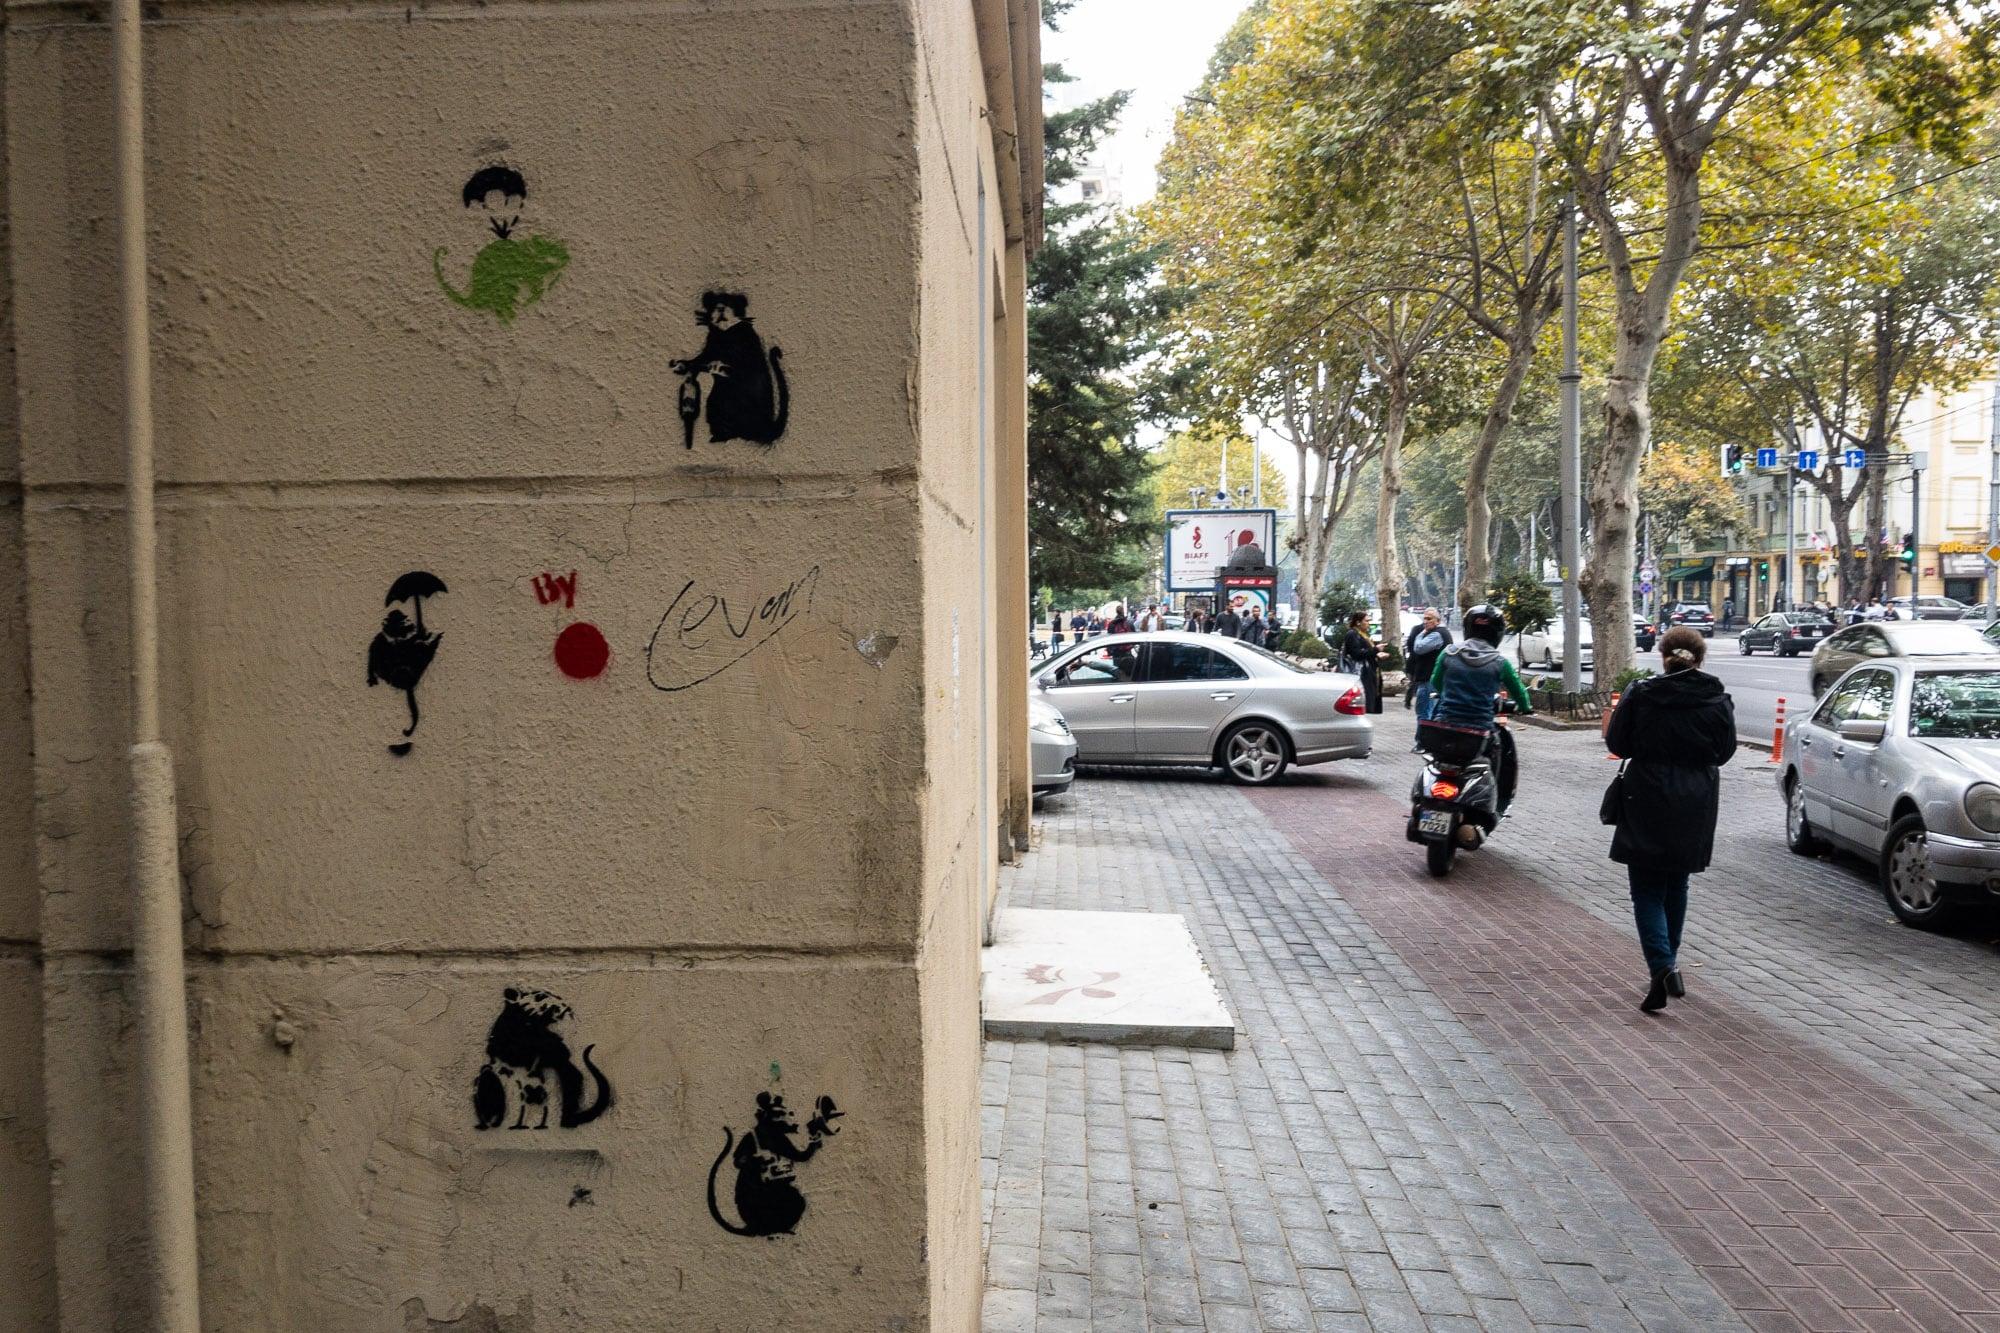 Tbilisi graffiti